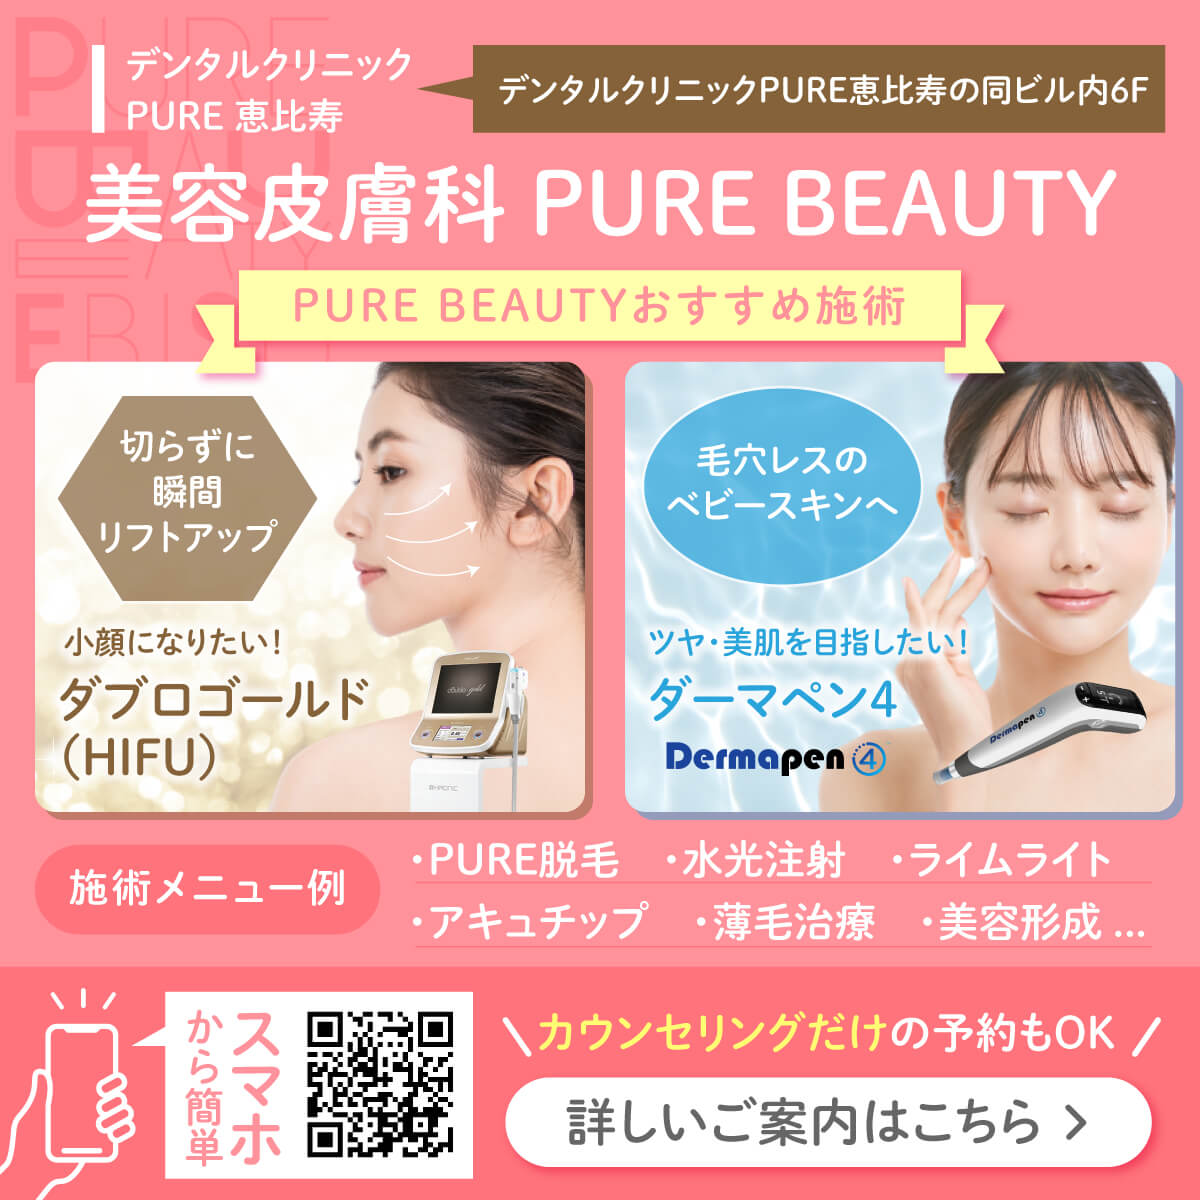 美容皮膚科PURE BEAUTY